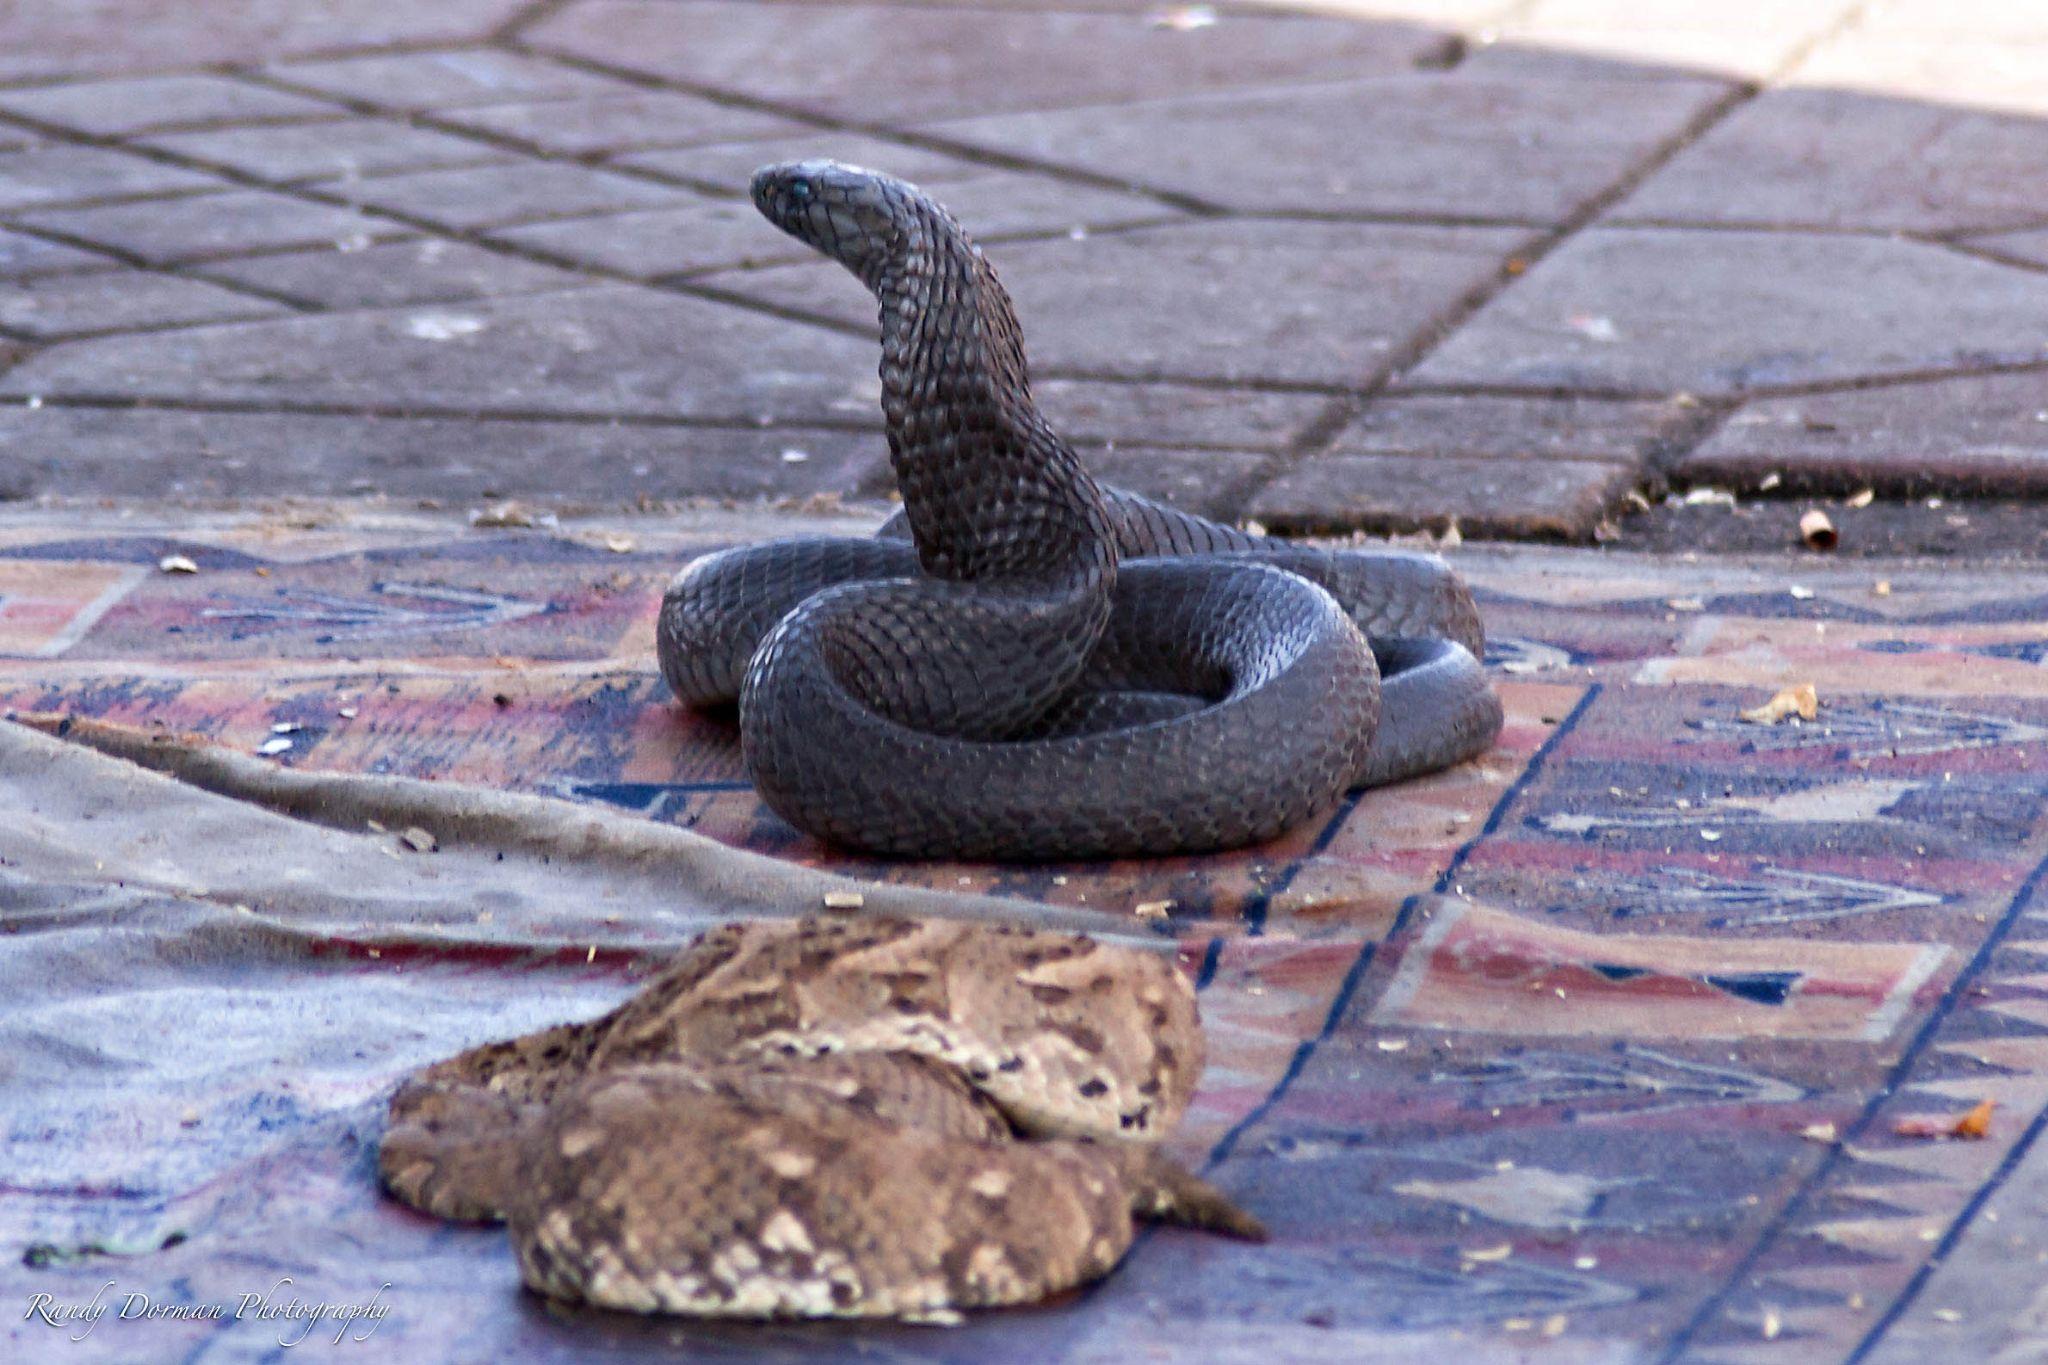 Snakes Djemaa el-Fna Market by Randy Dorman